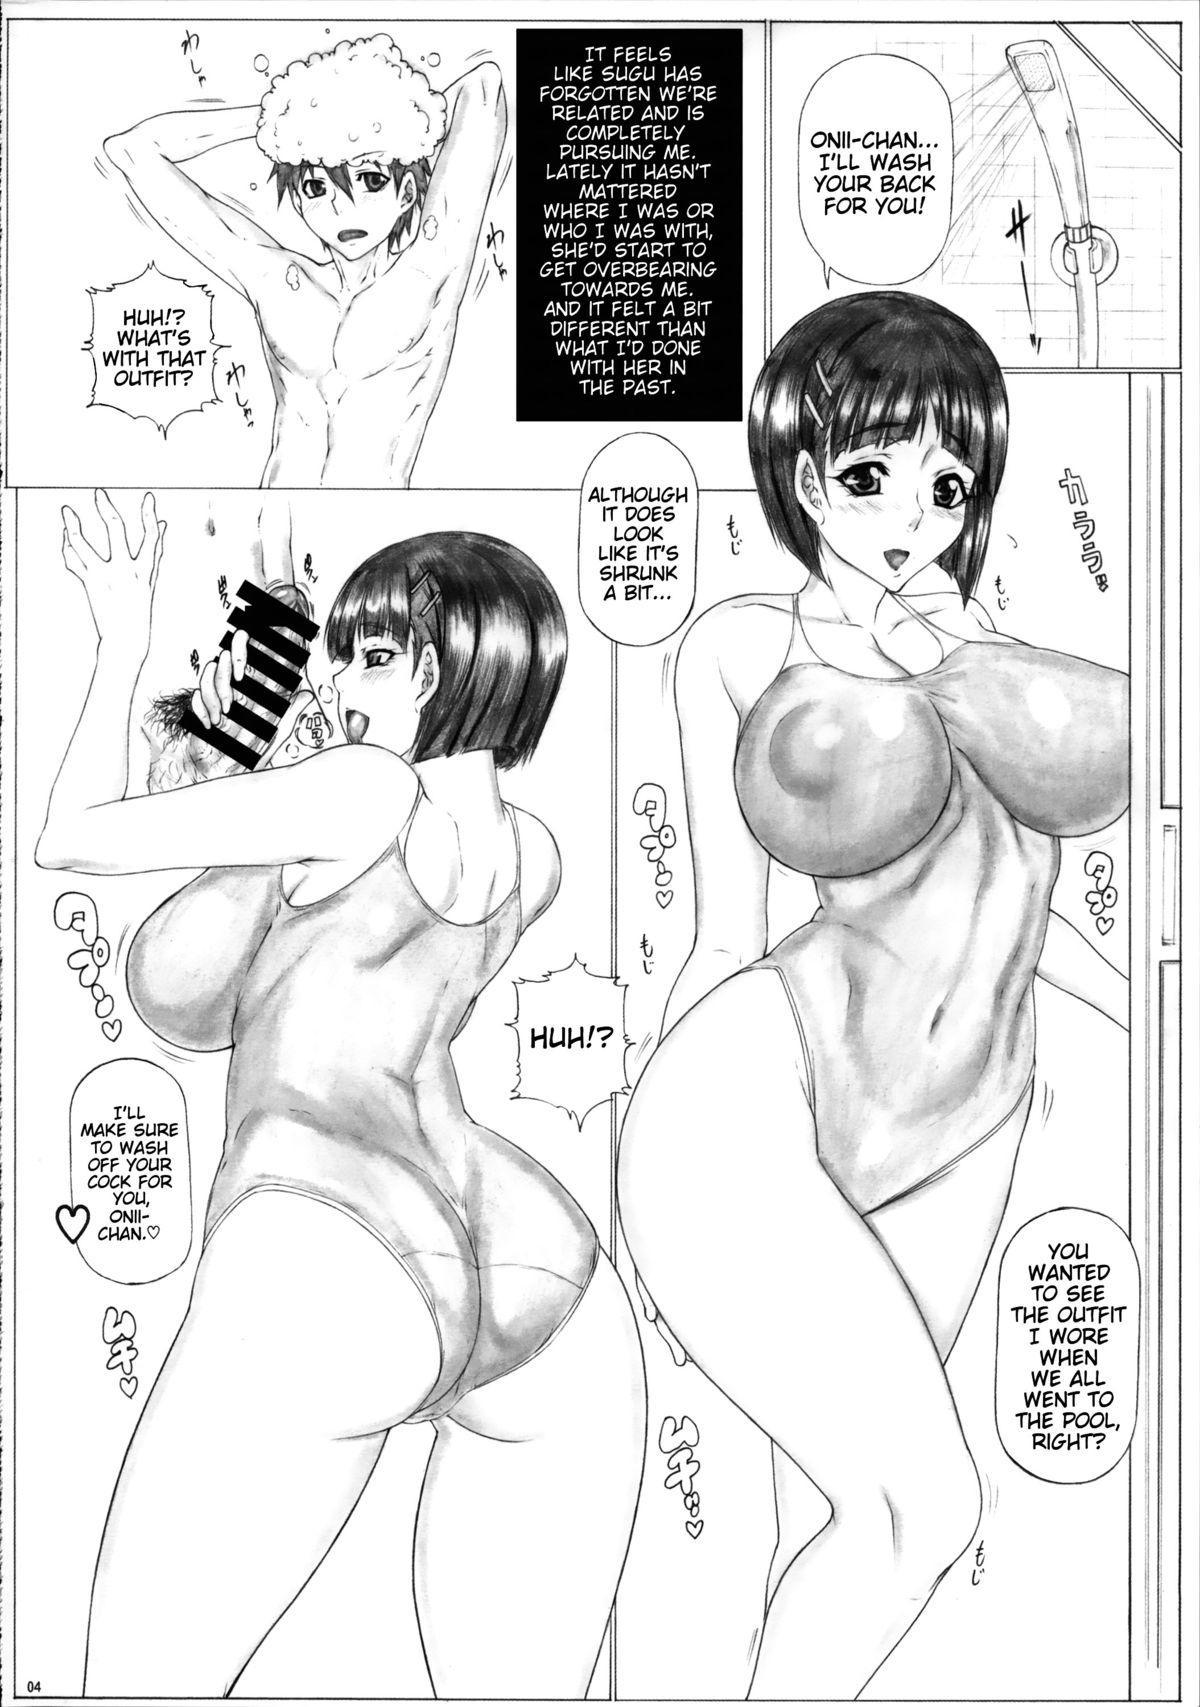 Angel's stroke 81 Suguha Scramble! 2 Oniichan no Seiyoku Kanri | Suguha Scramble! 2 Onii-chan's Libido Management 4